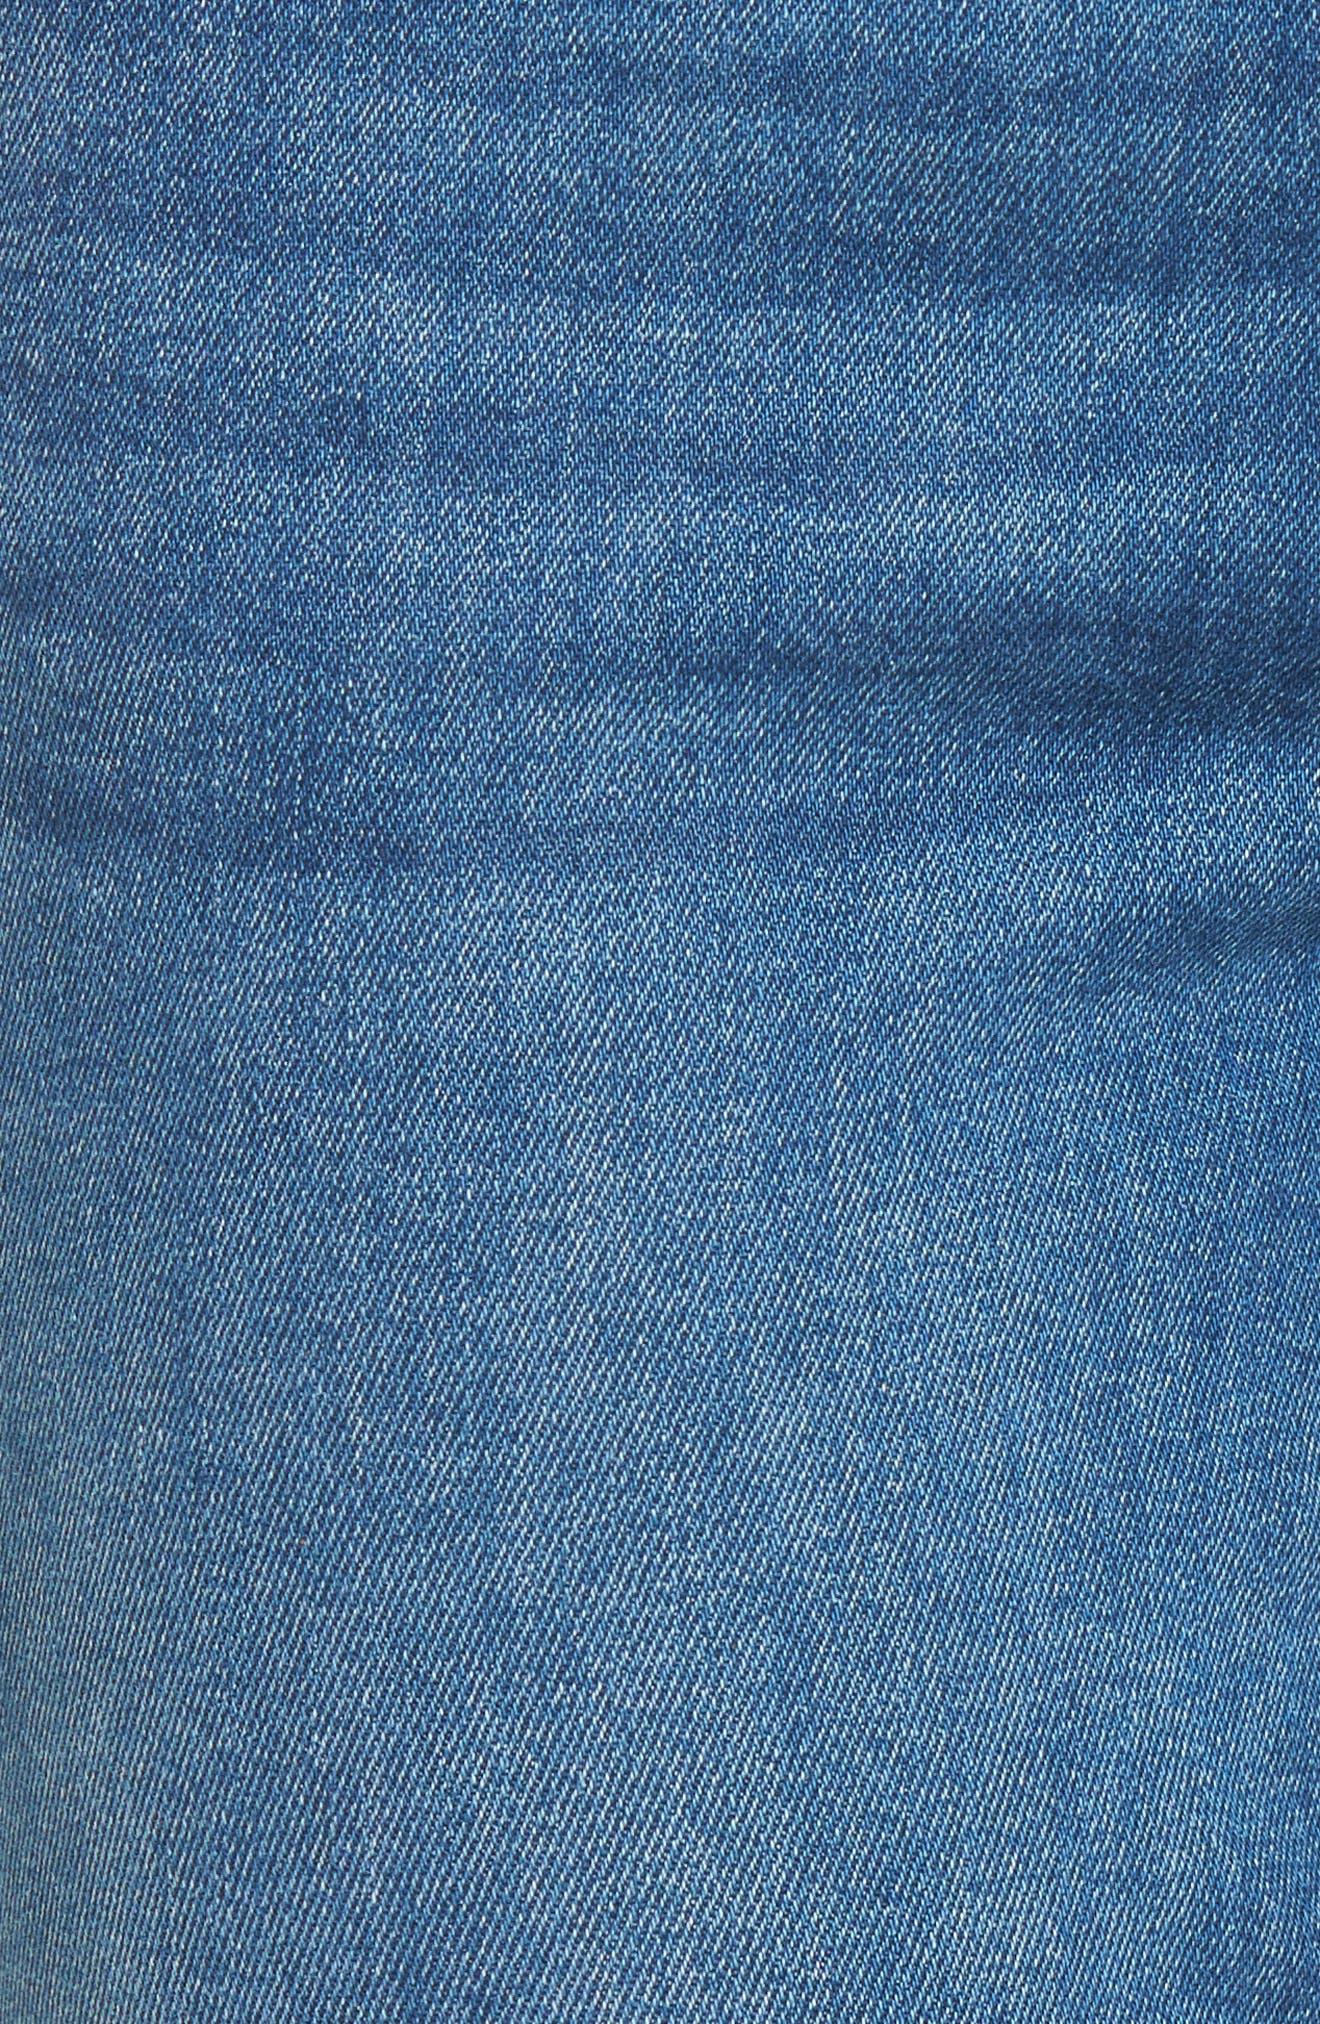 Jagger Skinny Jeans,                             Alternate thumbnail 5, color,